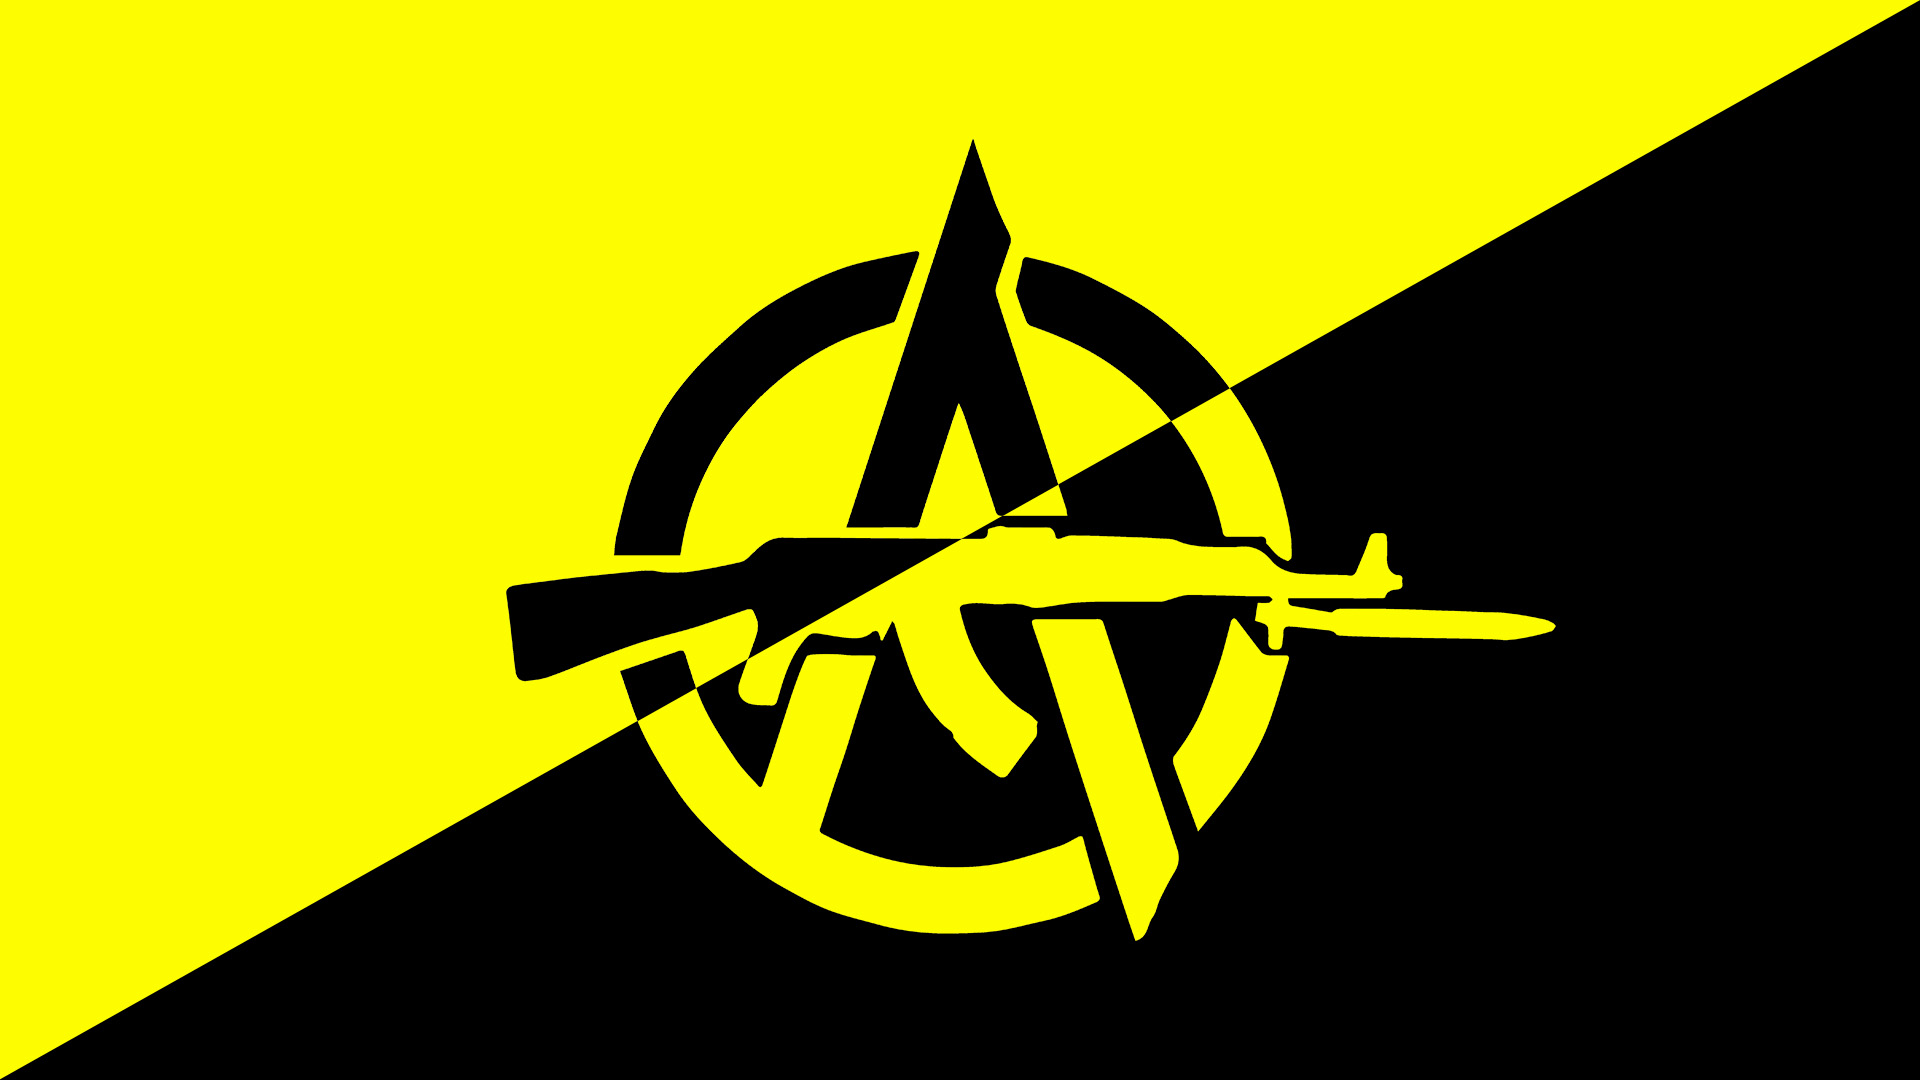 libertarian wallpaper - photo #19